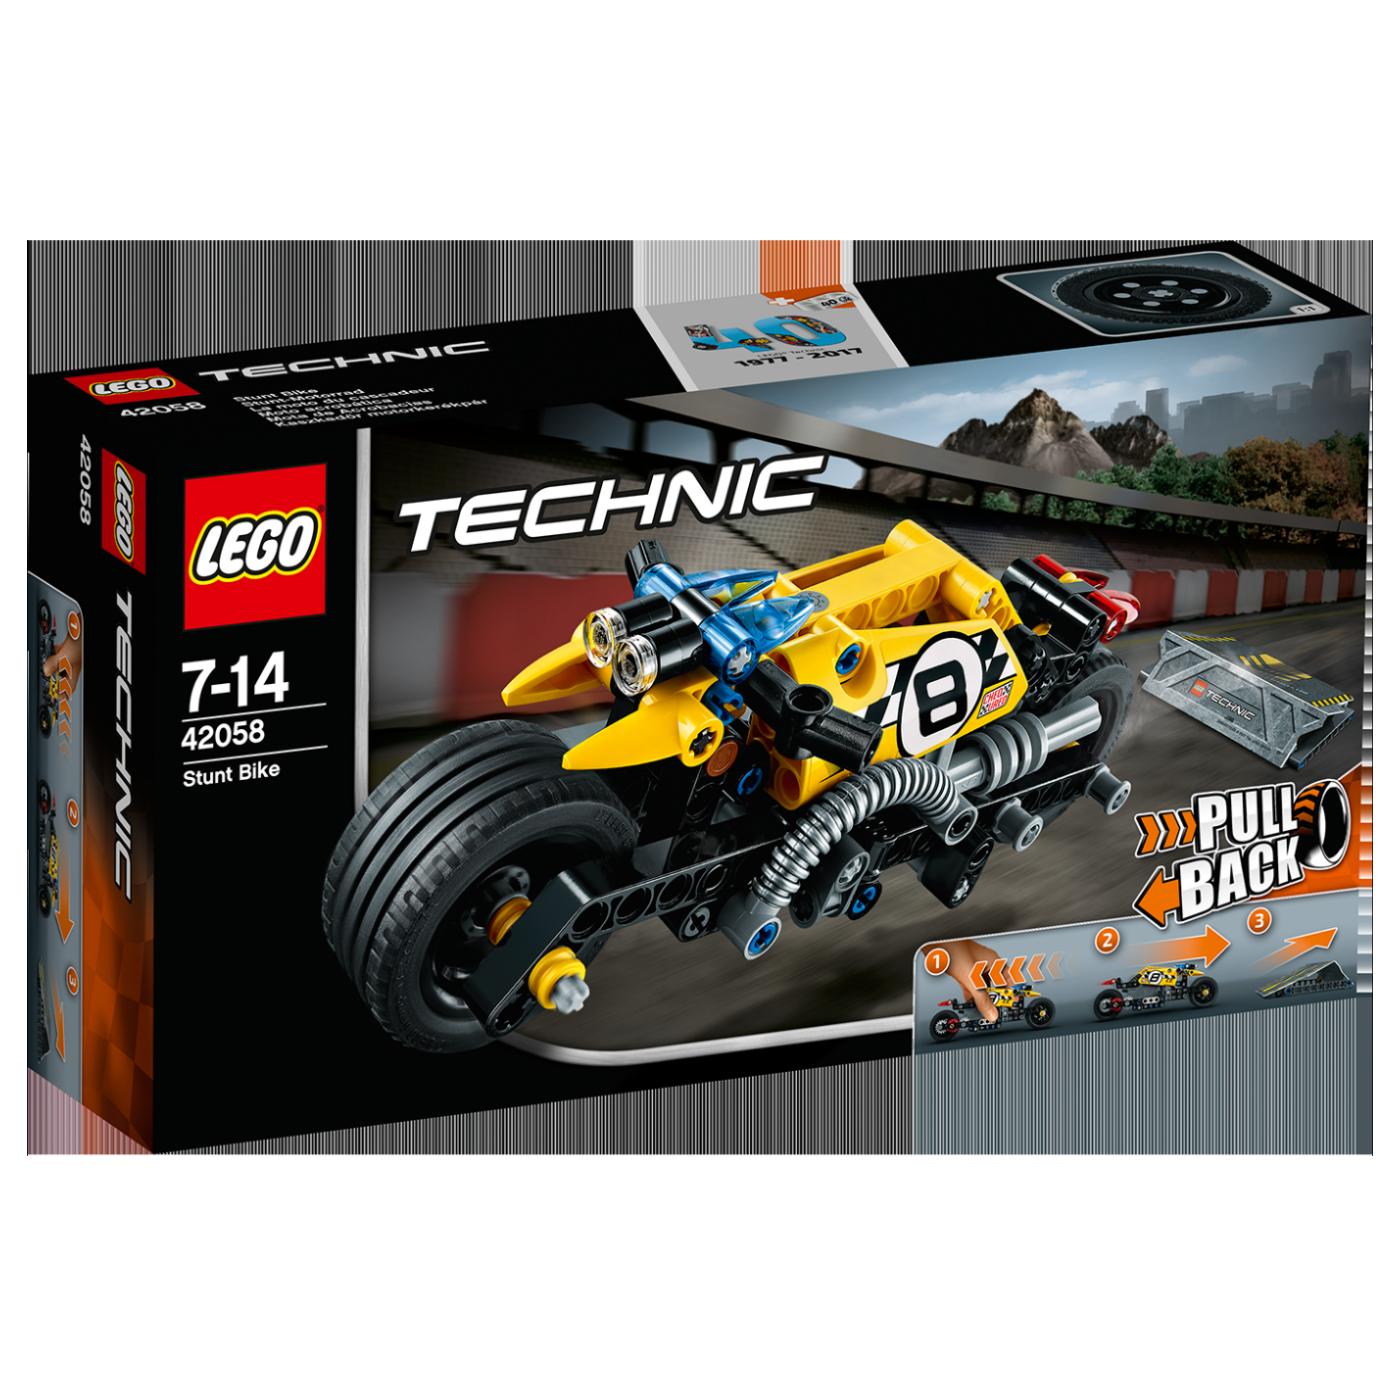 Motocikl za vratolomije, LEGO Technic